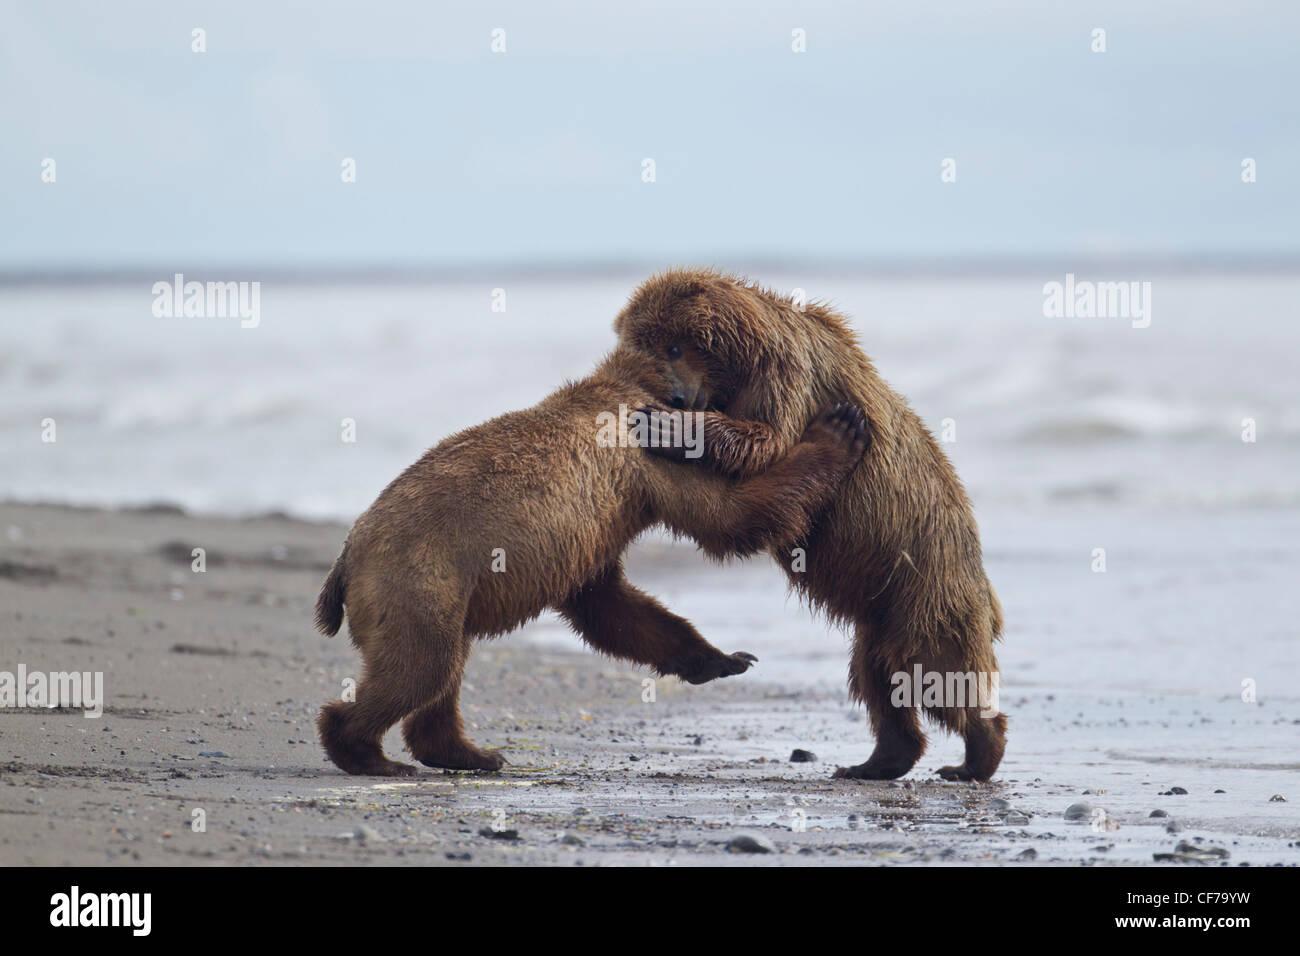 Alaskan brown bears fighting on beach in Lake Clark National Park - Stock Image